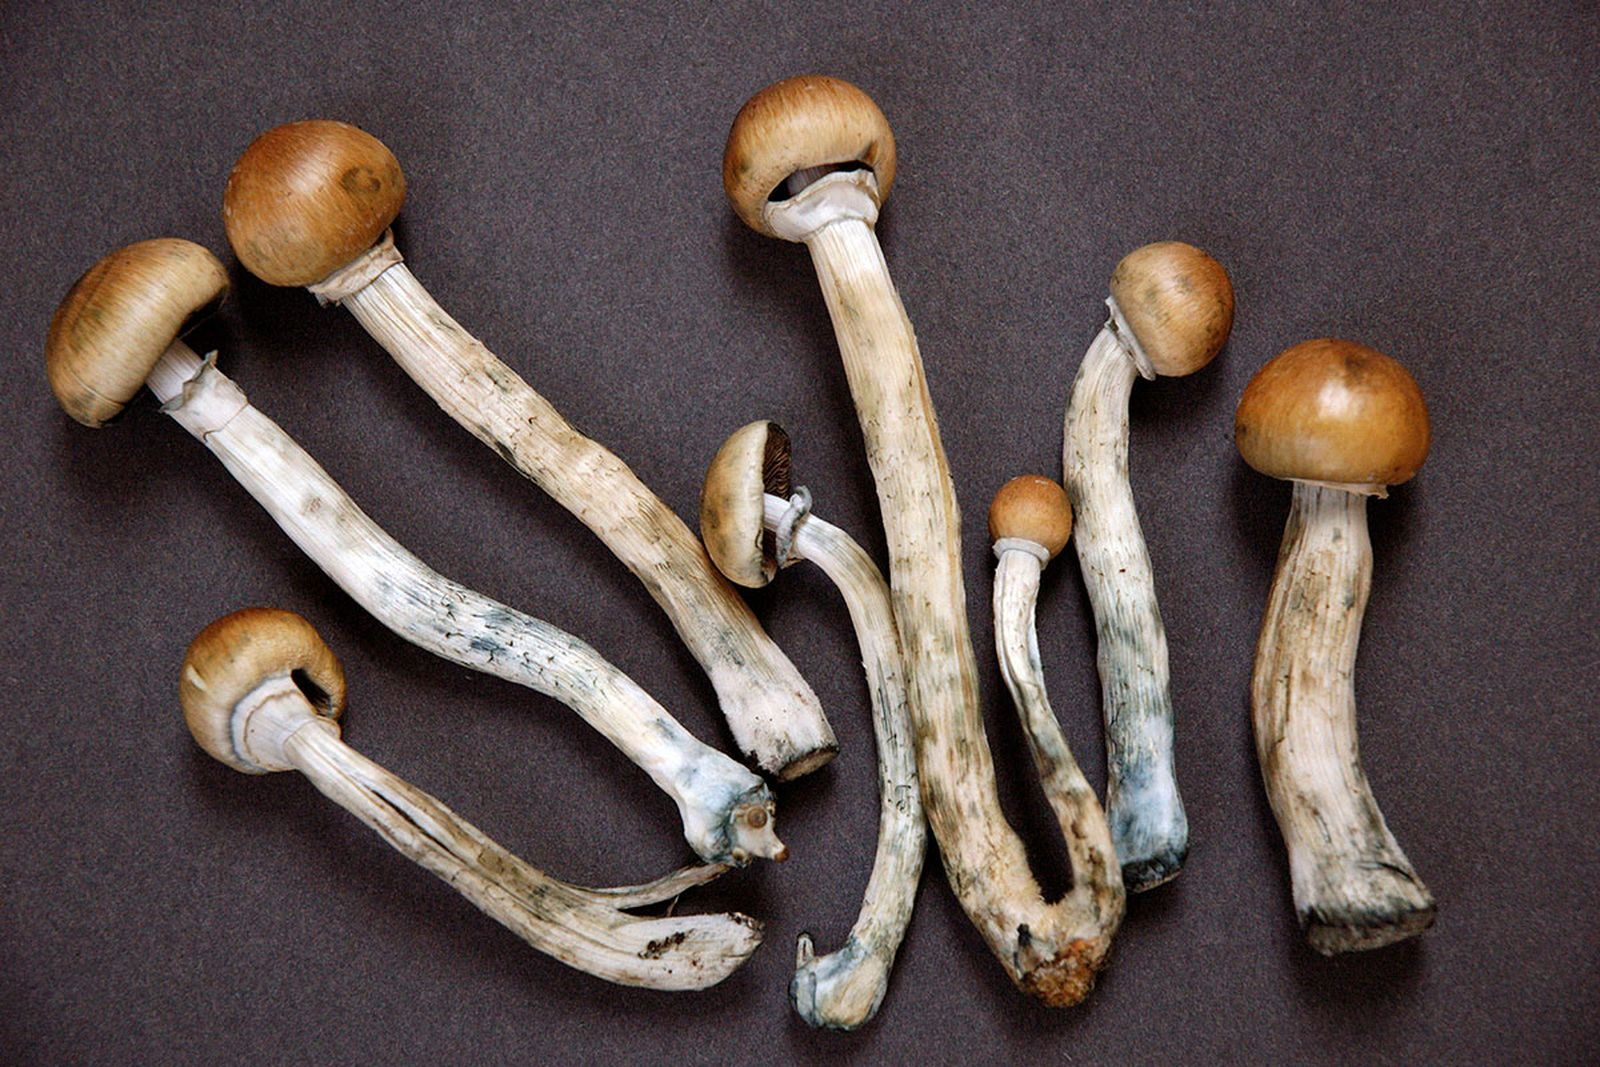 guide to microdosing Alfred Hofmann lsd